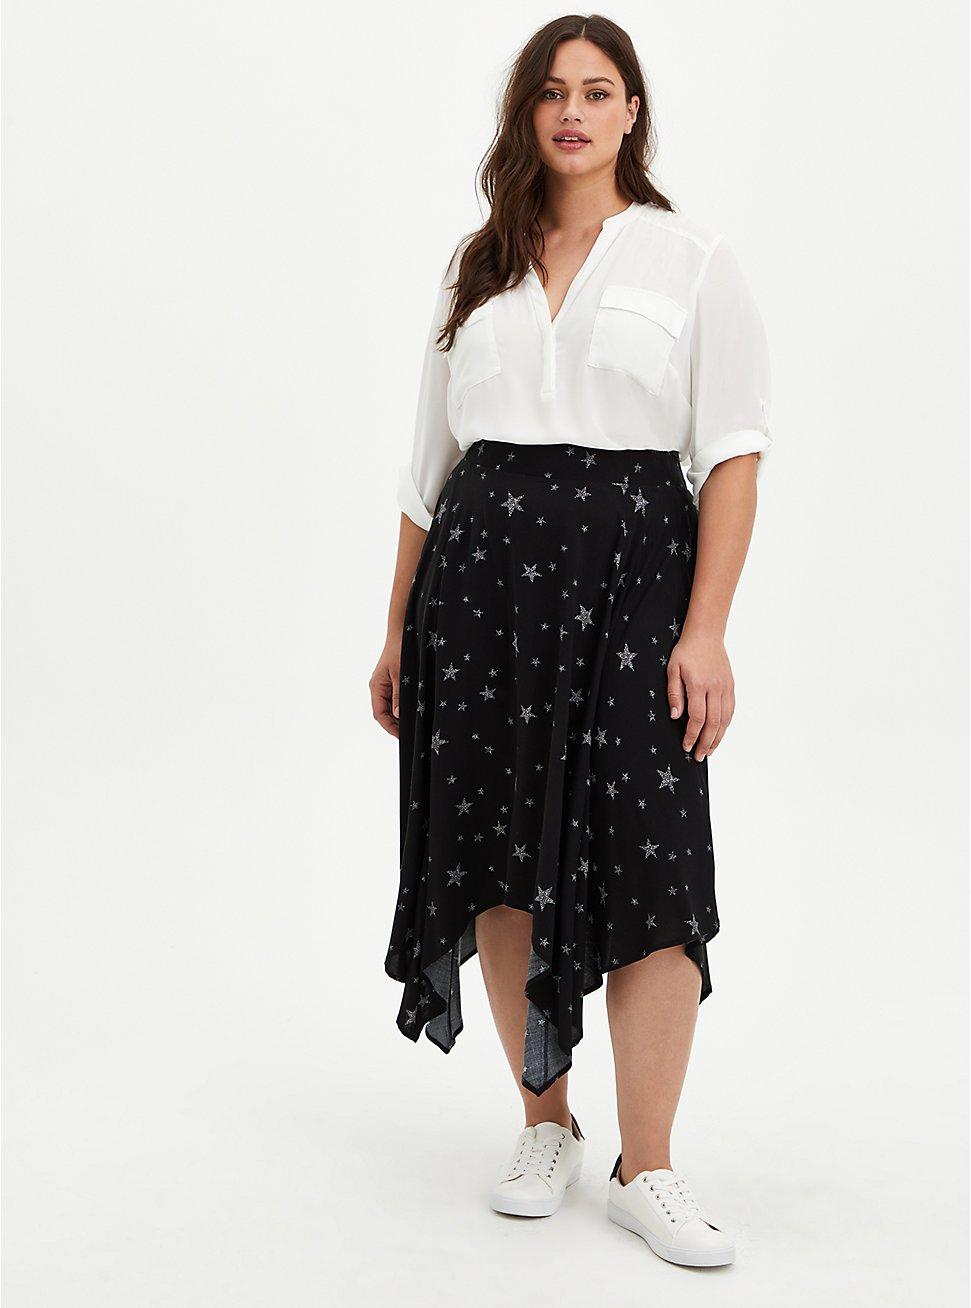 Handkerchief Midi Skirt - Challis Star Black, TIGER DYE, hi-res